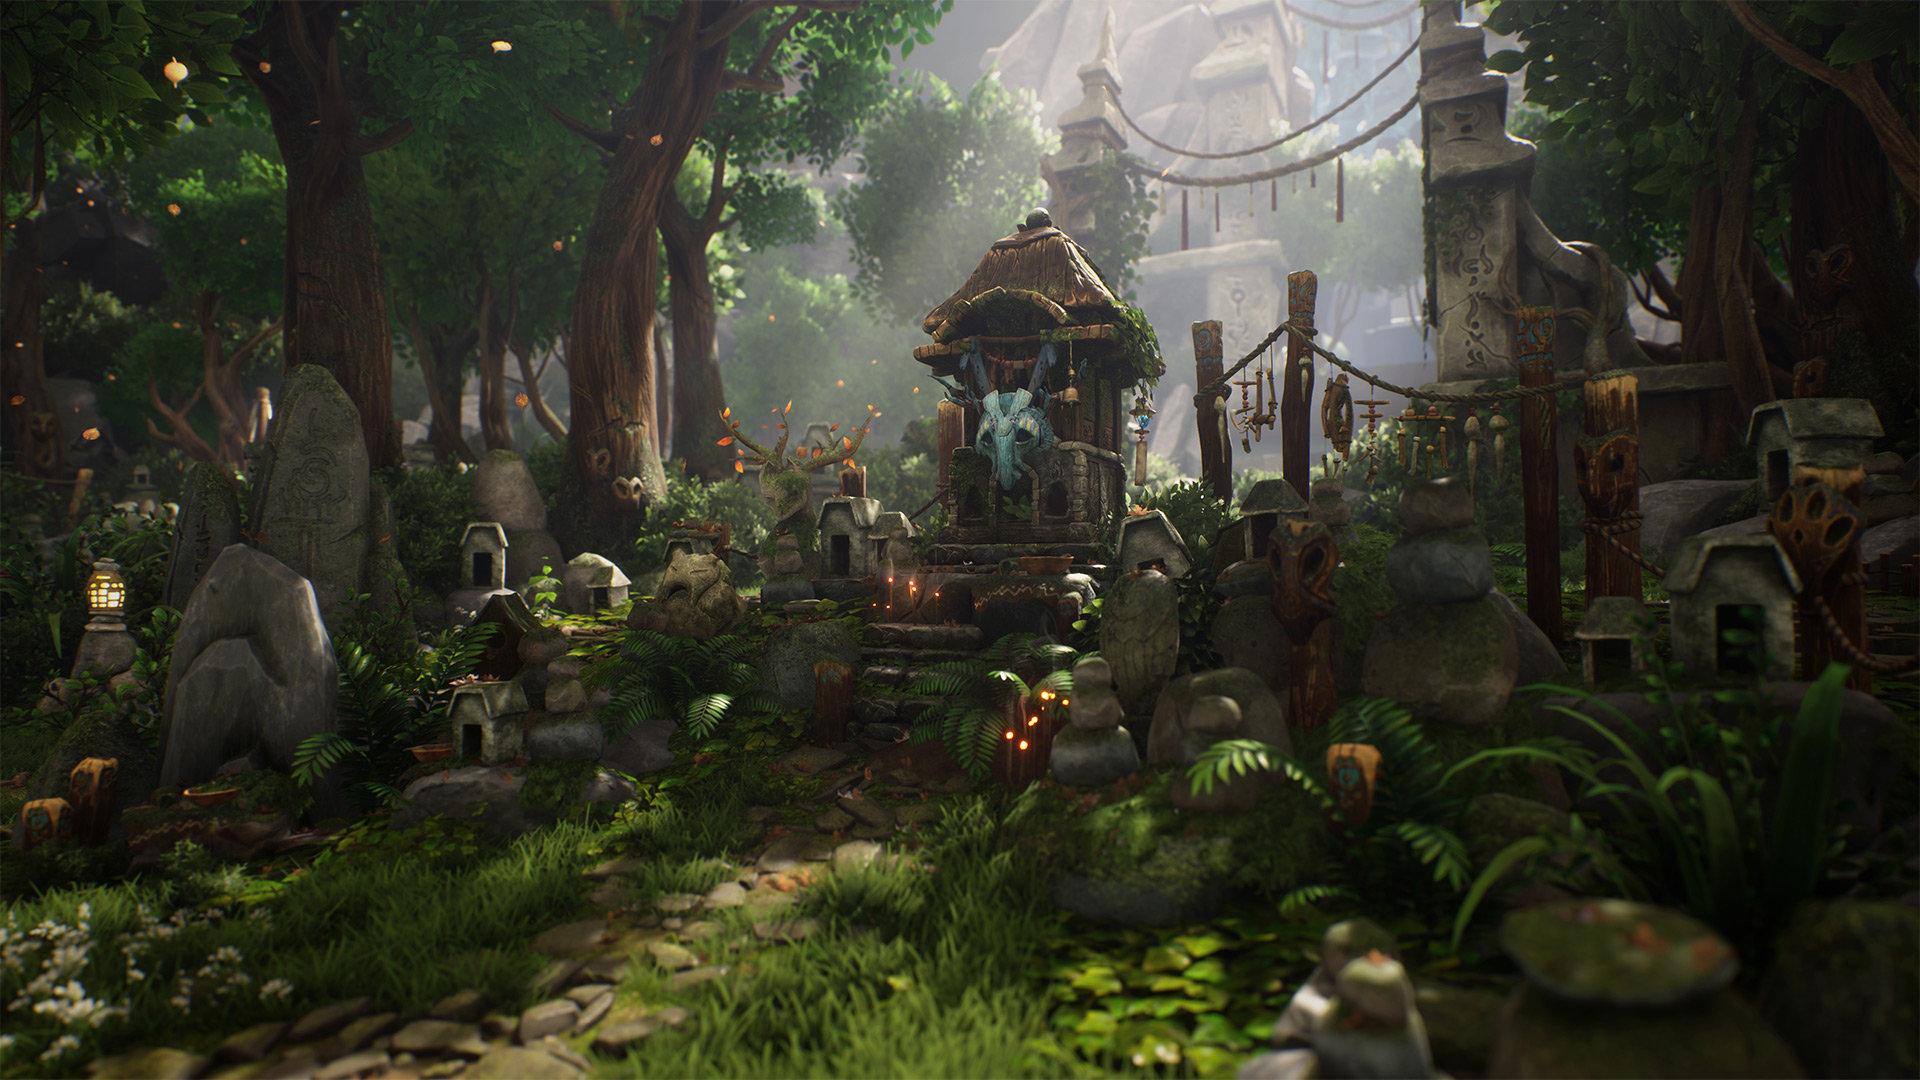 kena bridge of spirits video game hd wallpaper 2577